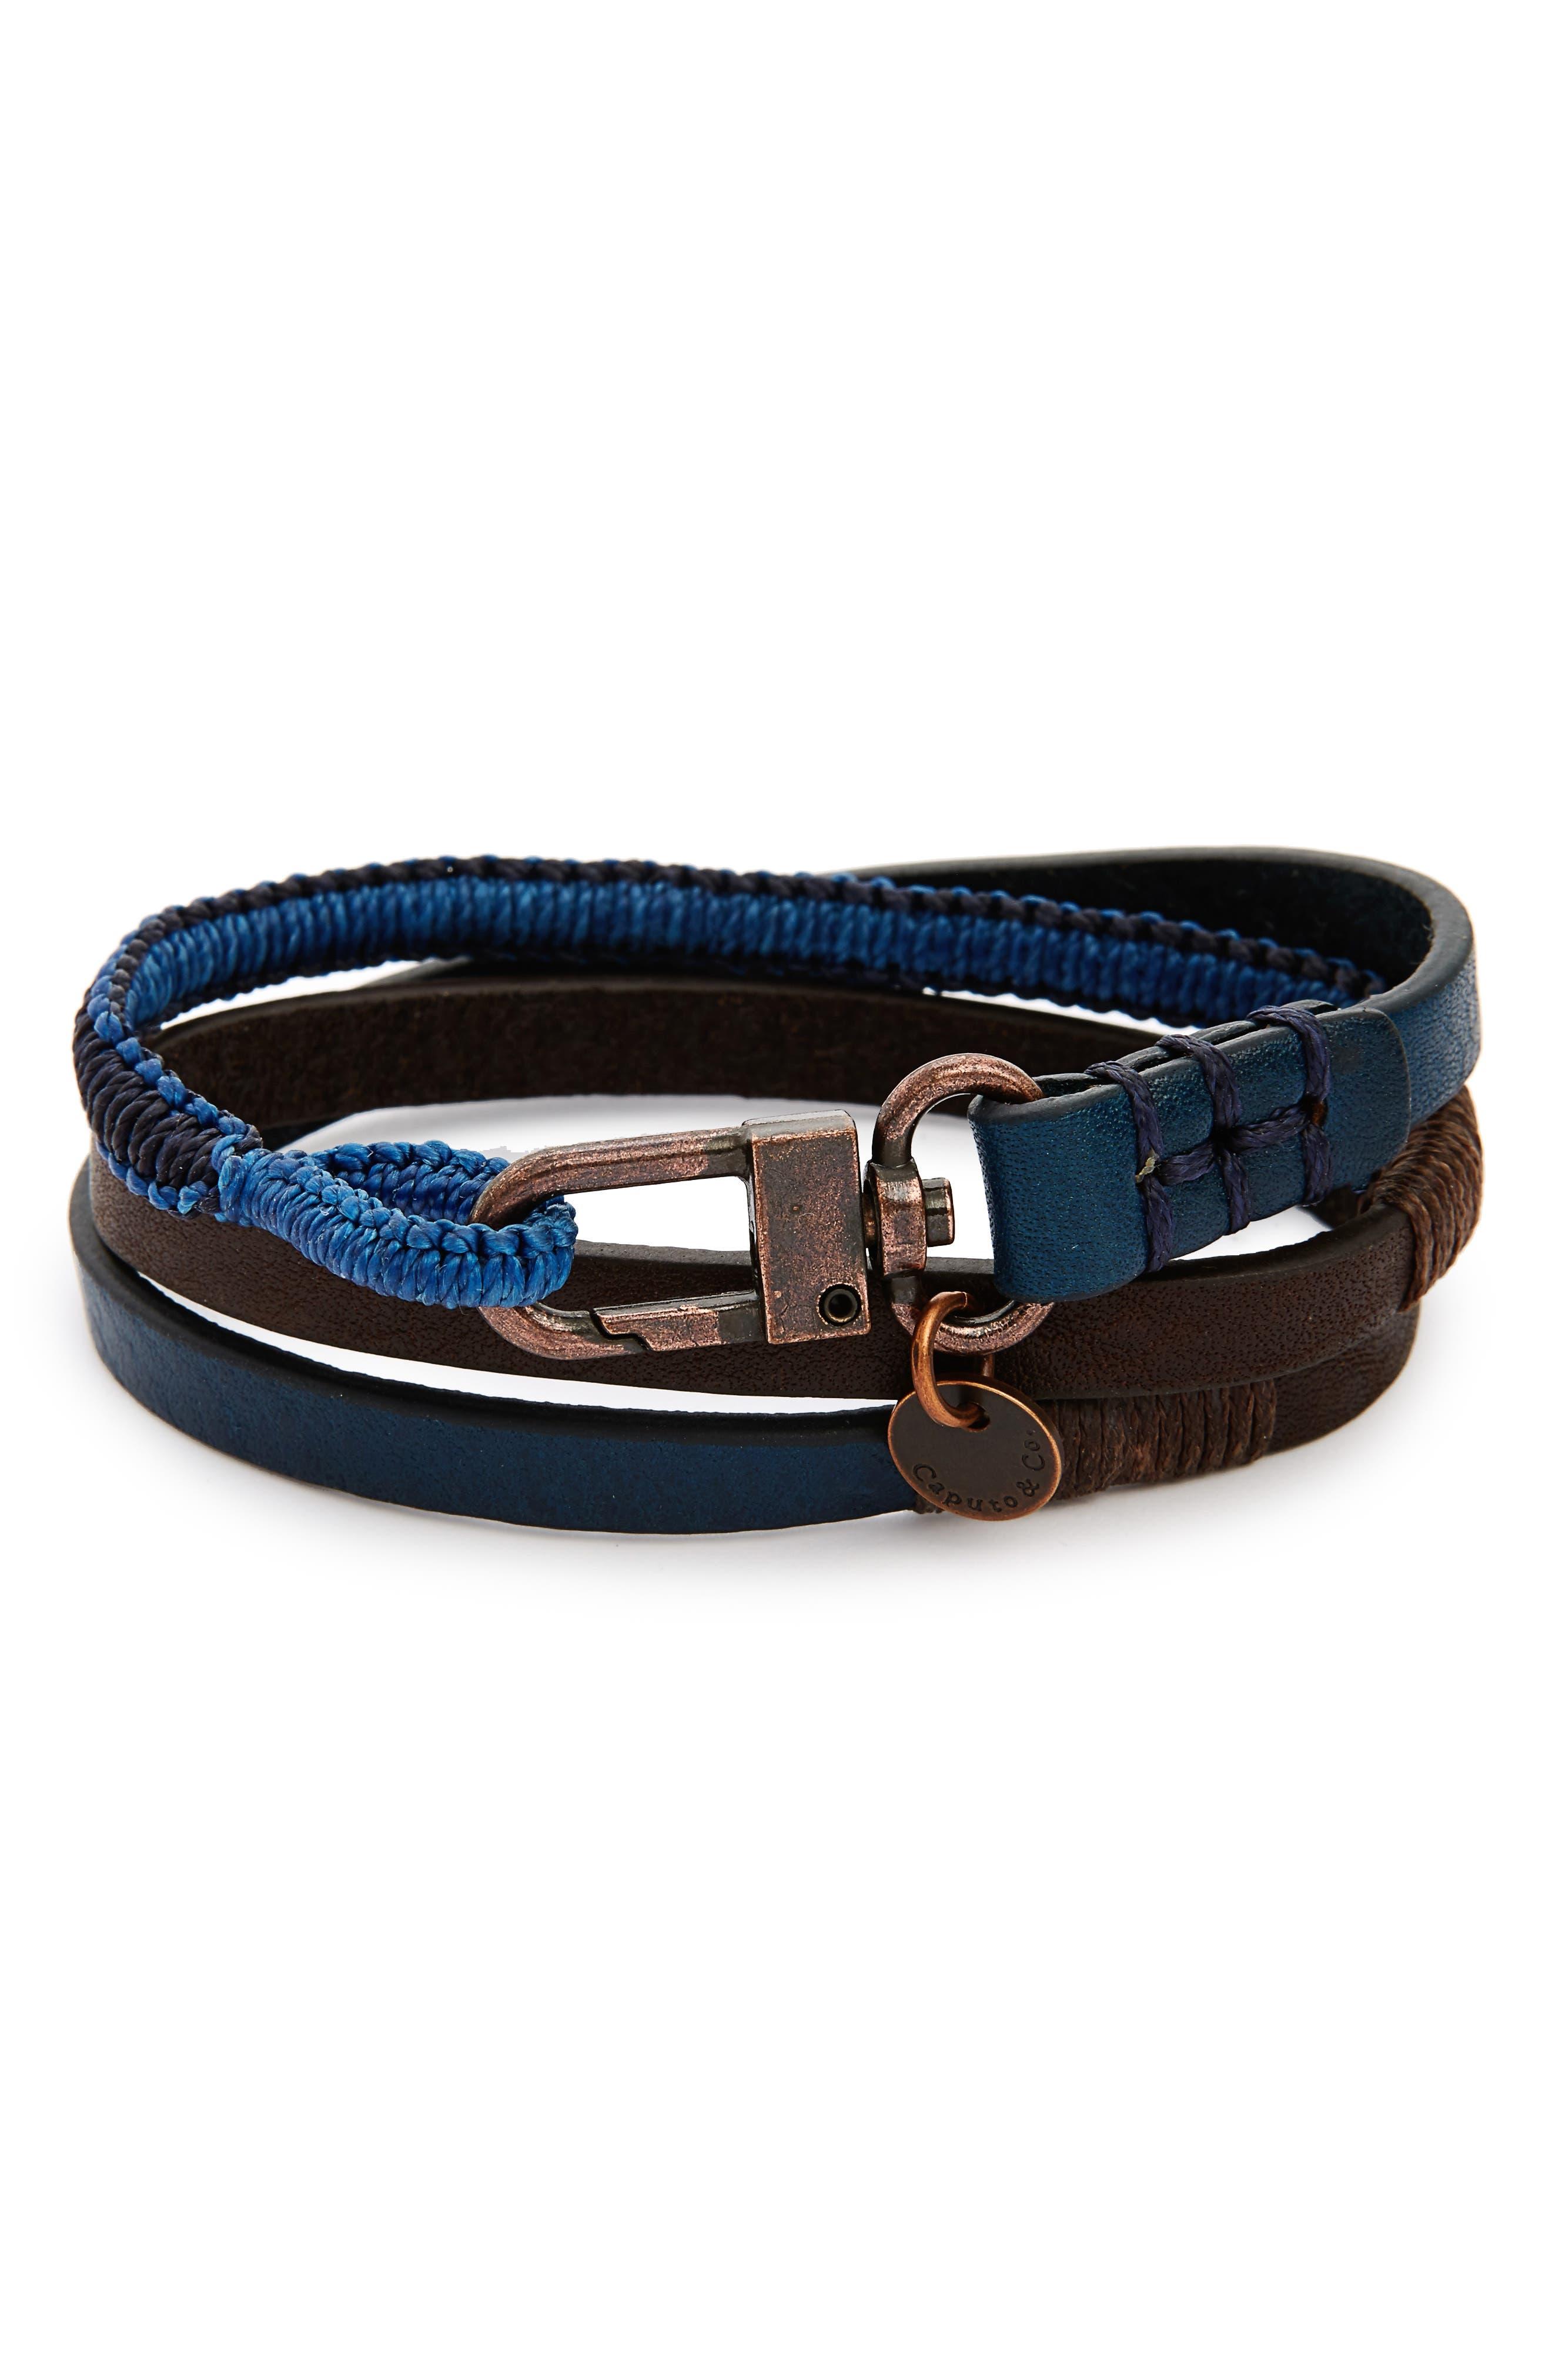 Alternate Image 1 Selected - Caputo & Co. Leather Wrap Bracelet